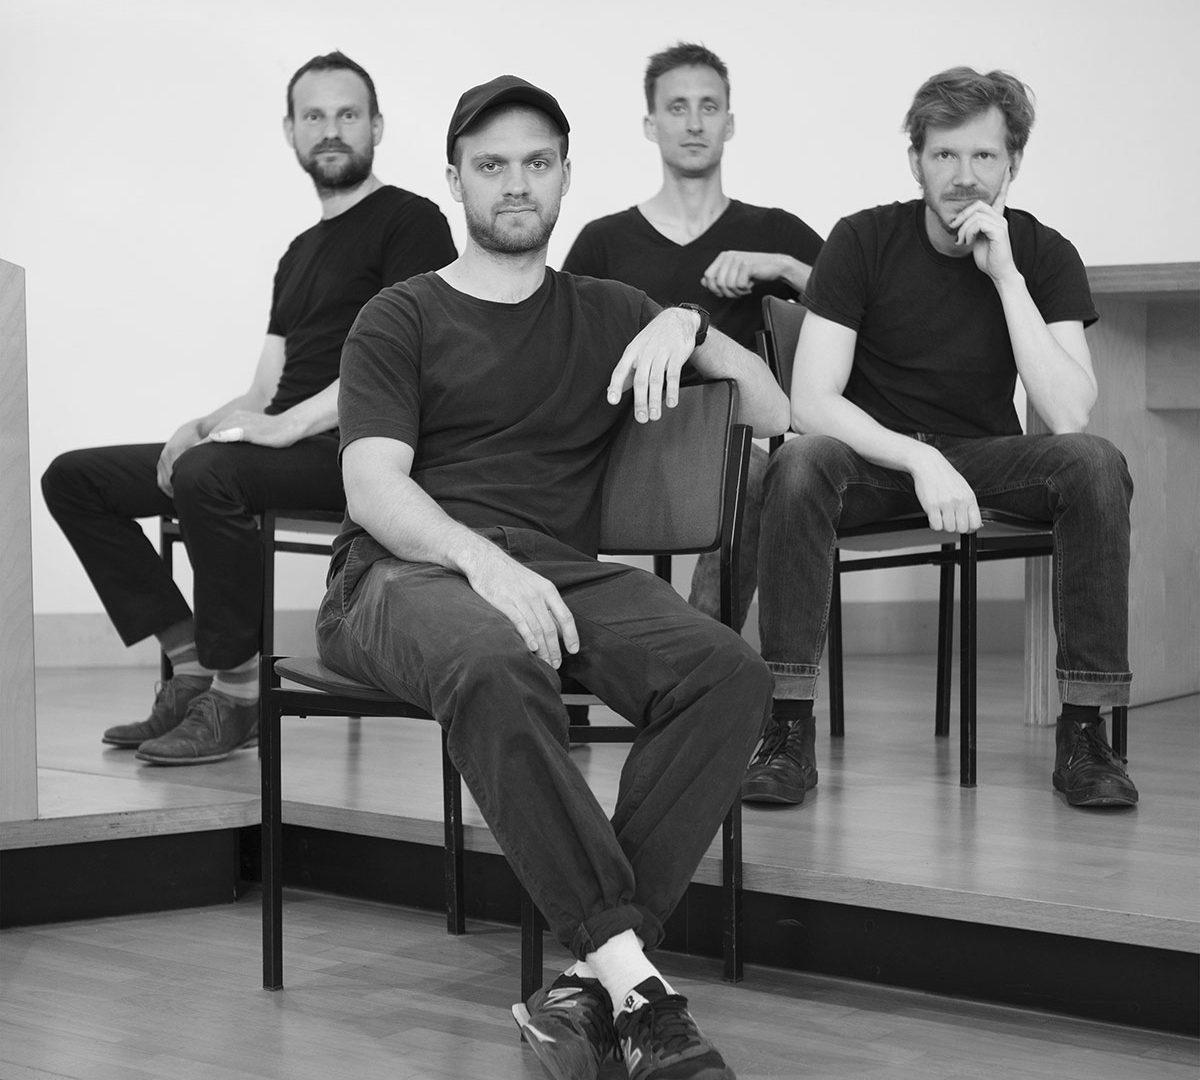 Stefan Schönegg, Enso, Leonhard Huhn, Nathan Bontrager, Stefan Schönegg, Etienne Nillesen, LOFT, IMPAKT, IMPAKT Night, livestream, jazzstadt, Köln, Cologne